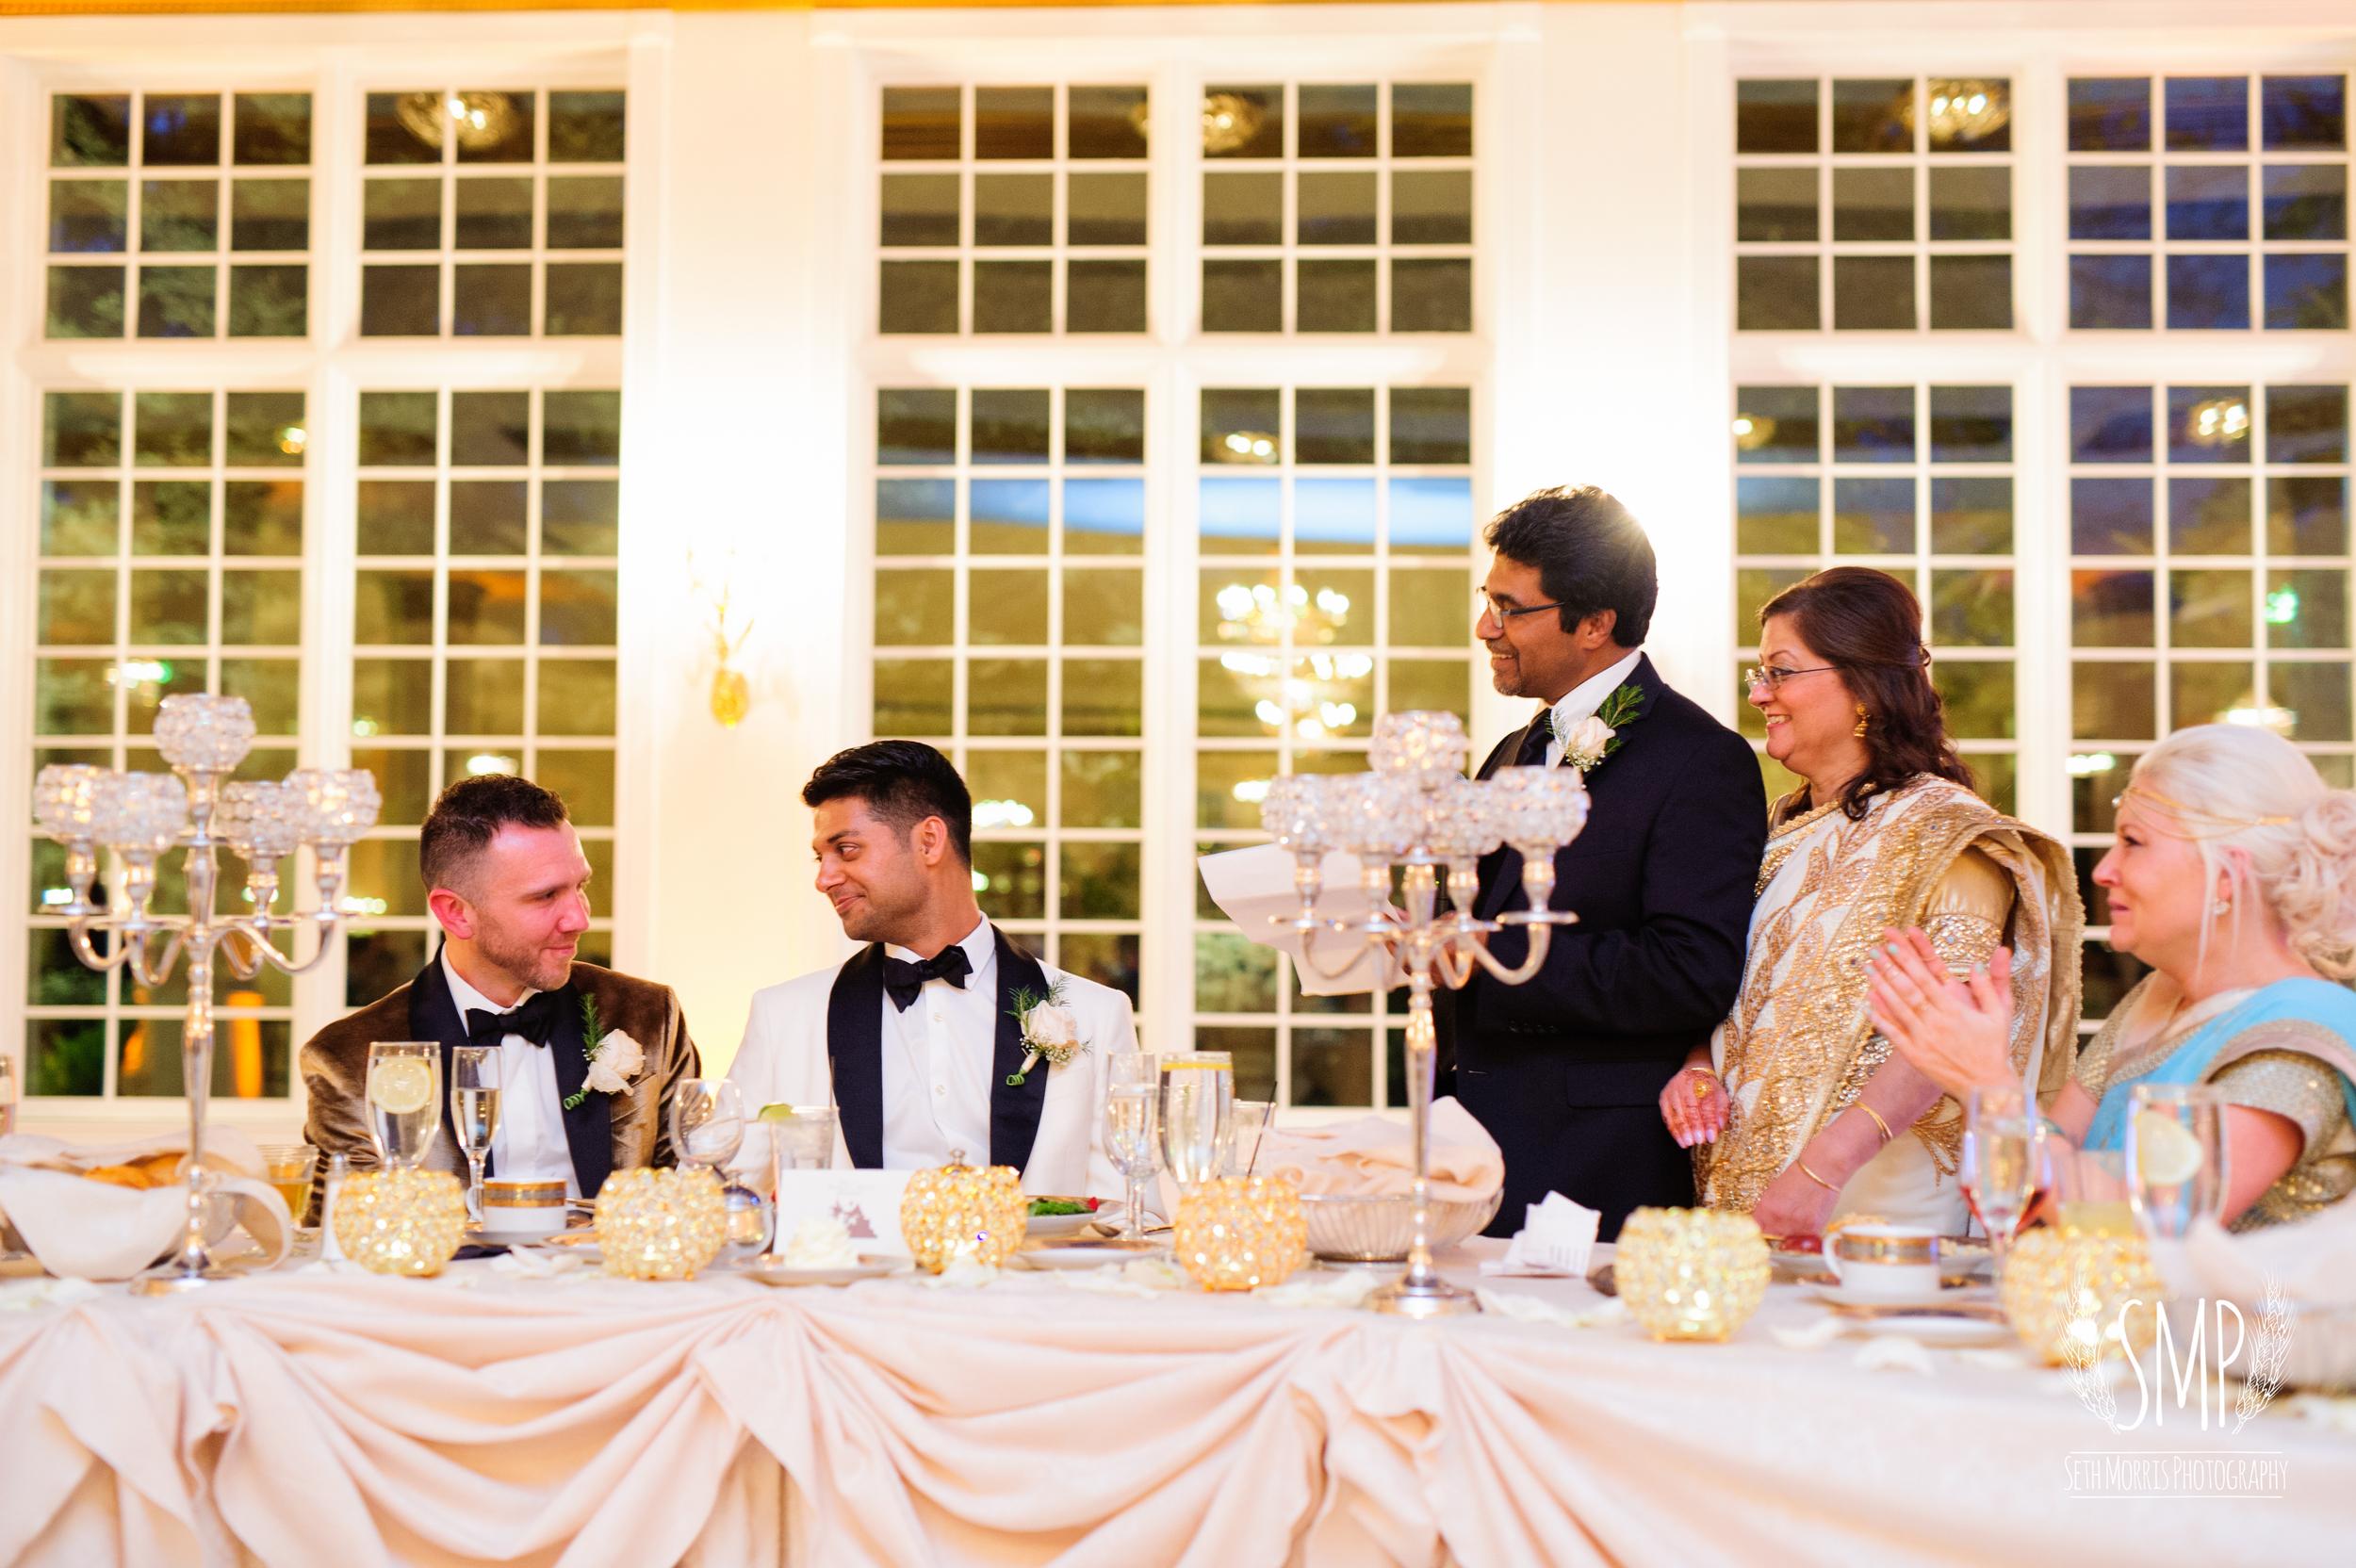 same-sex-wedding-photographer-chicago-illinois-100.jpg